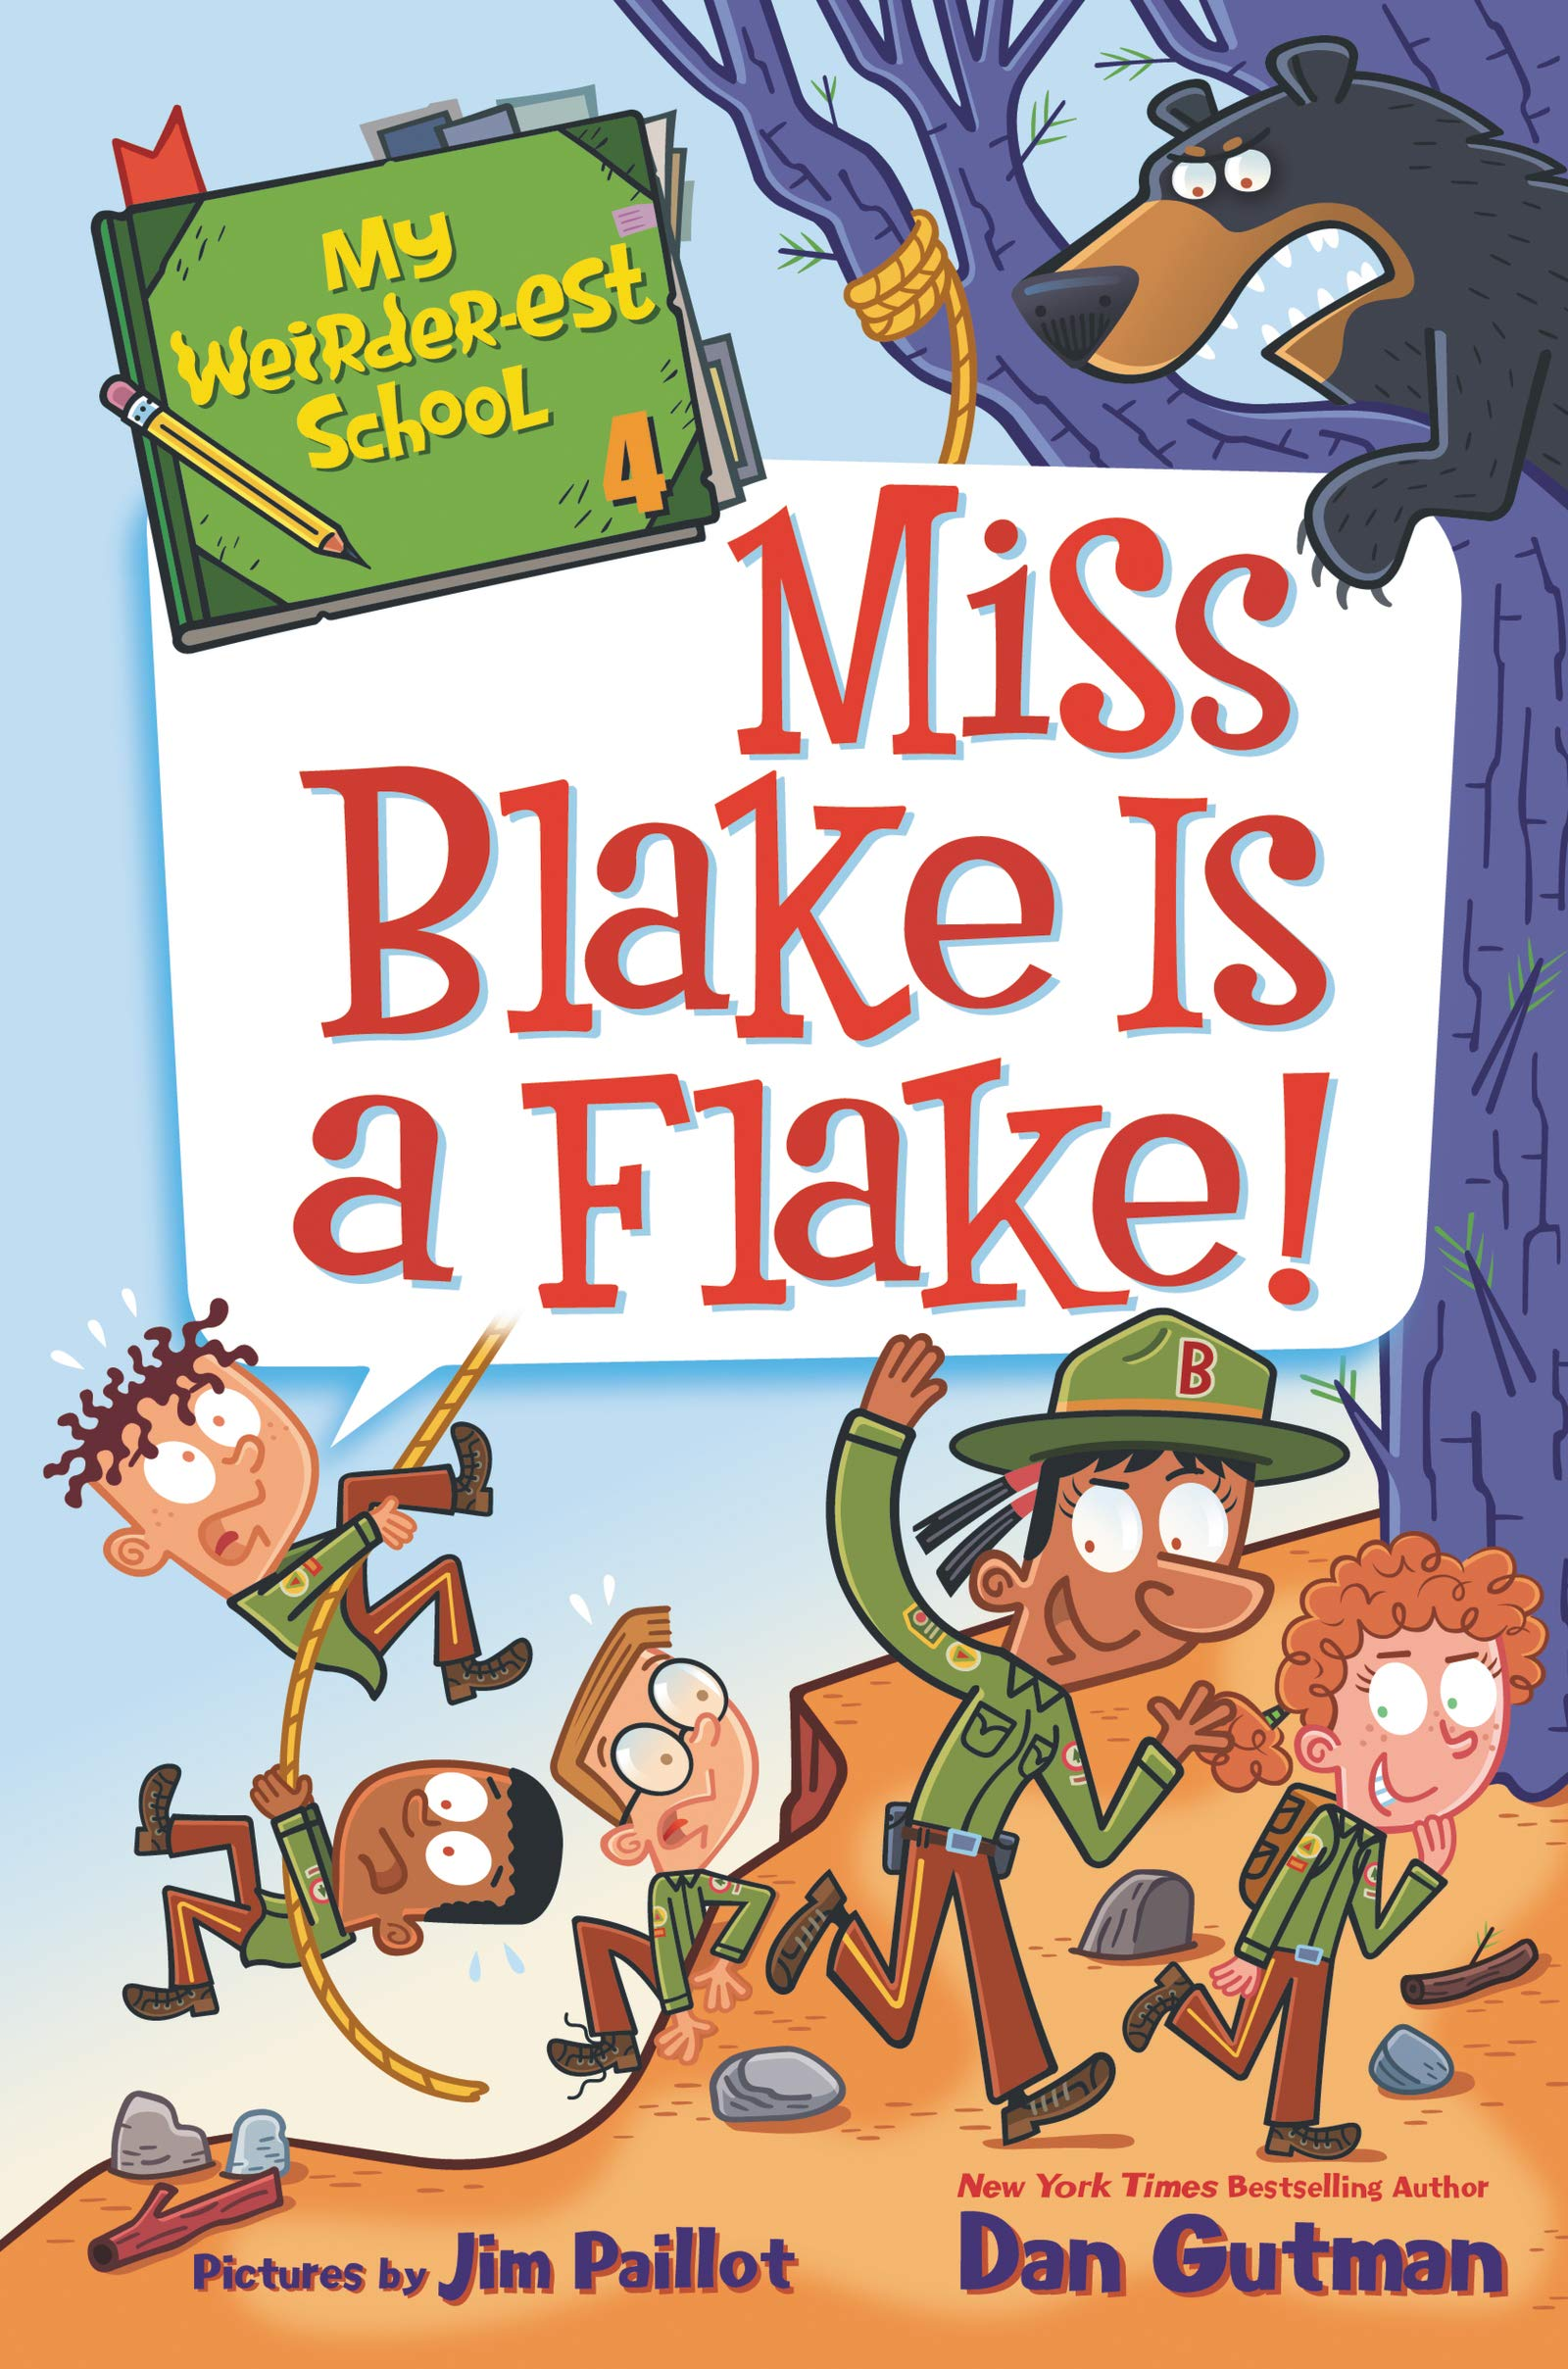 My Weird School Series: Miss Blake Is a Flake!